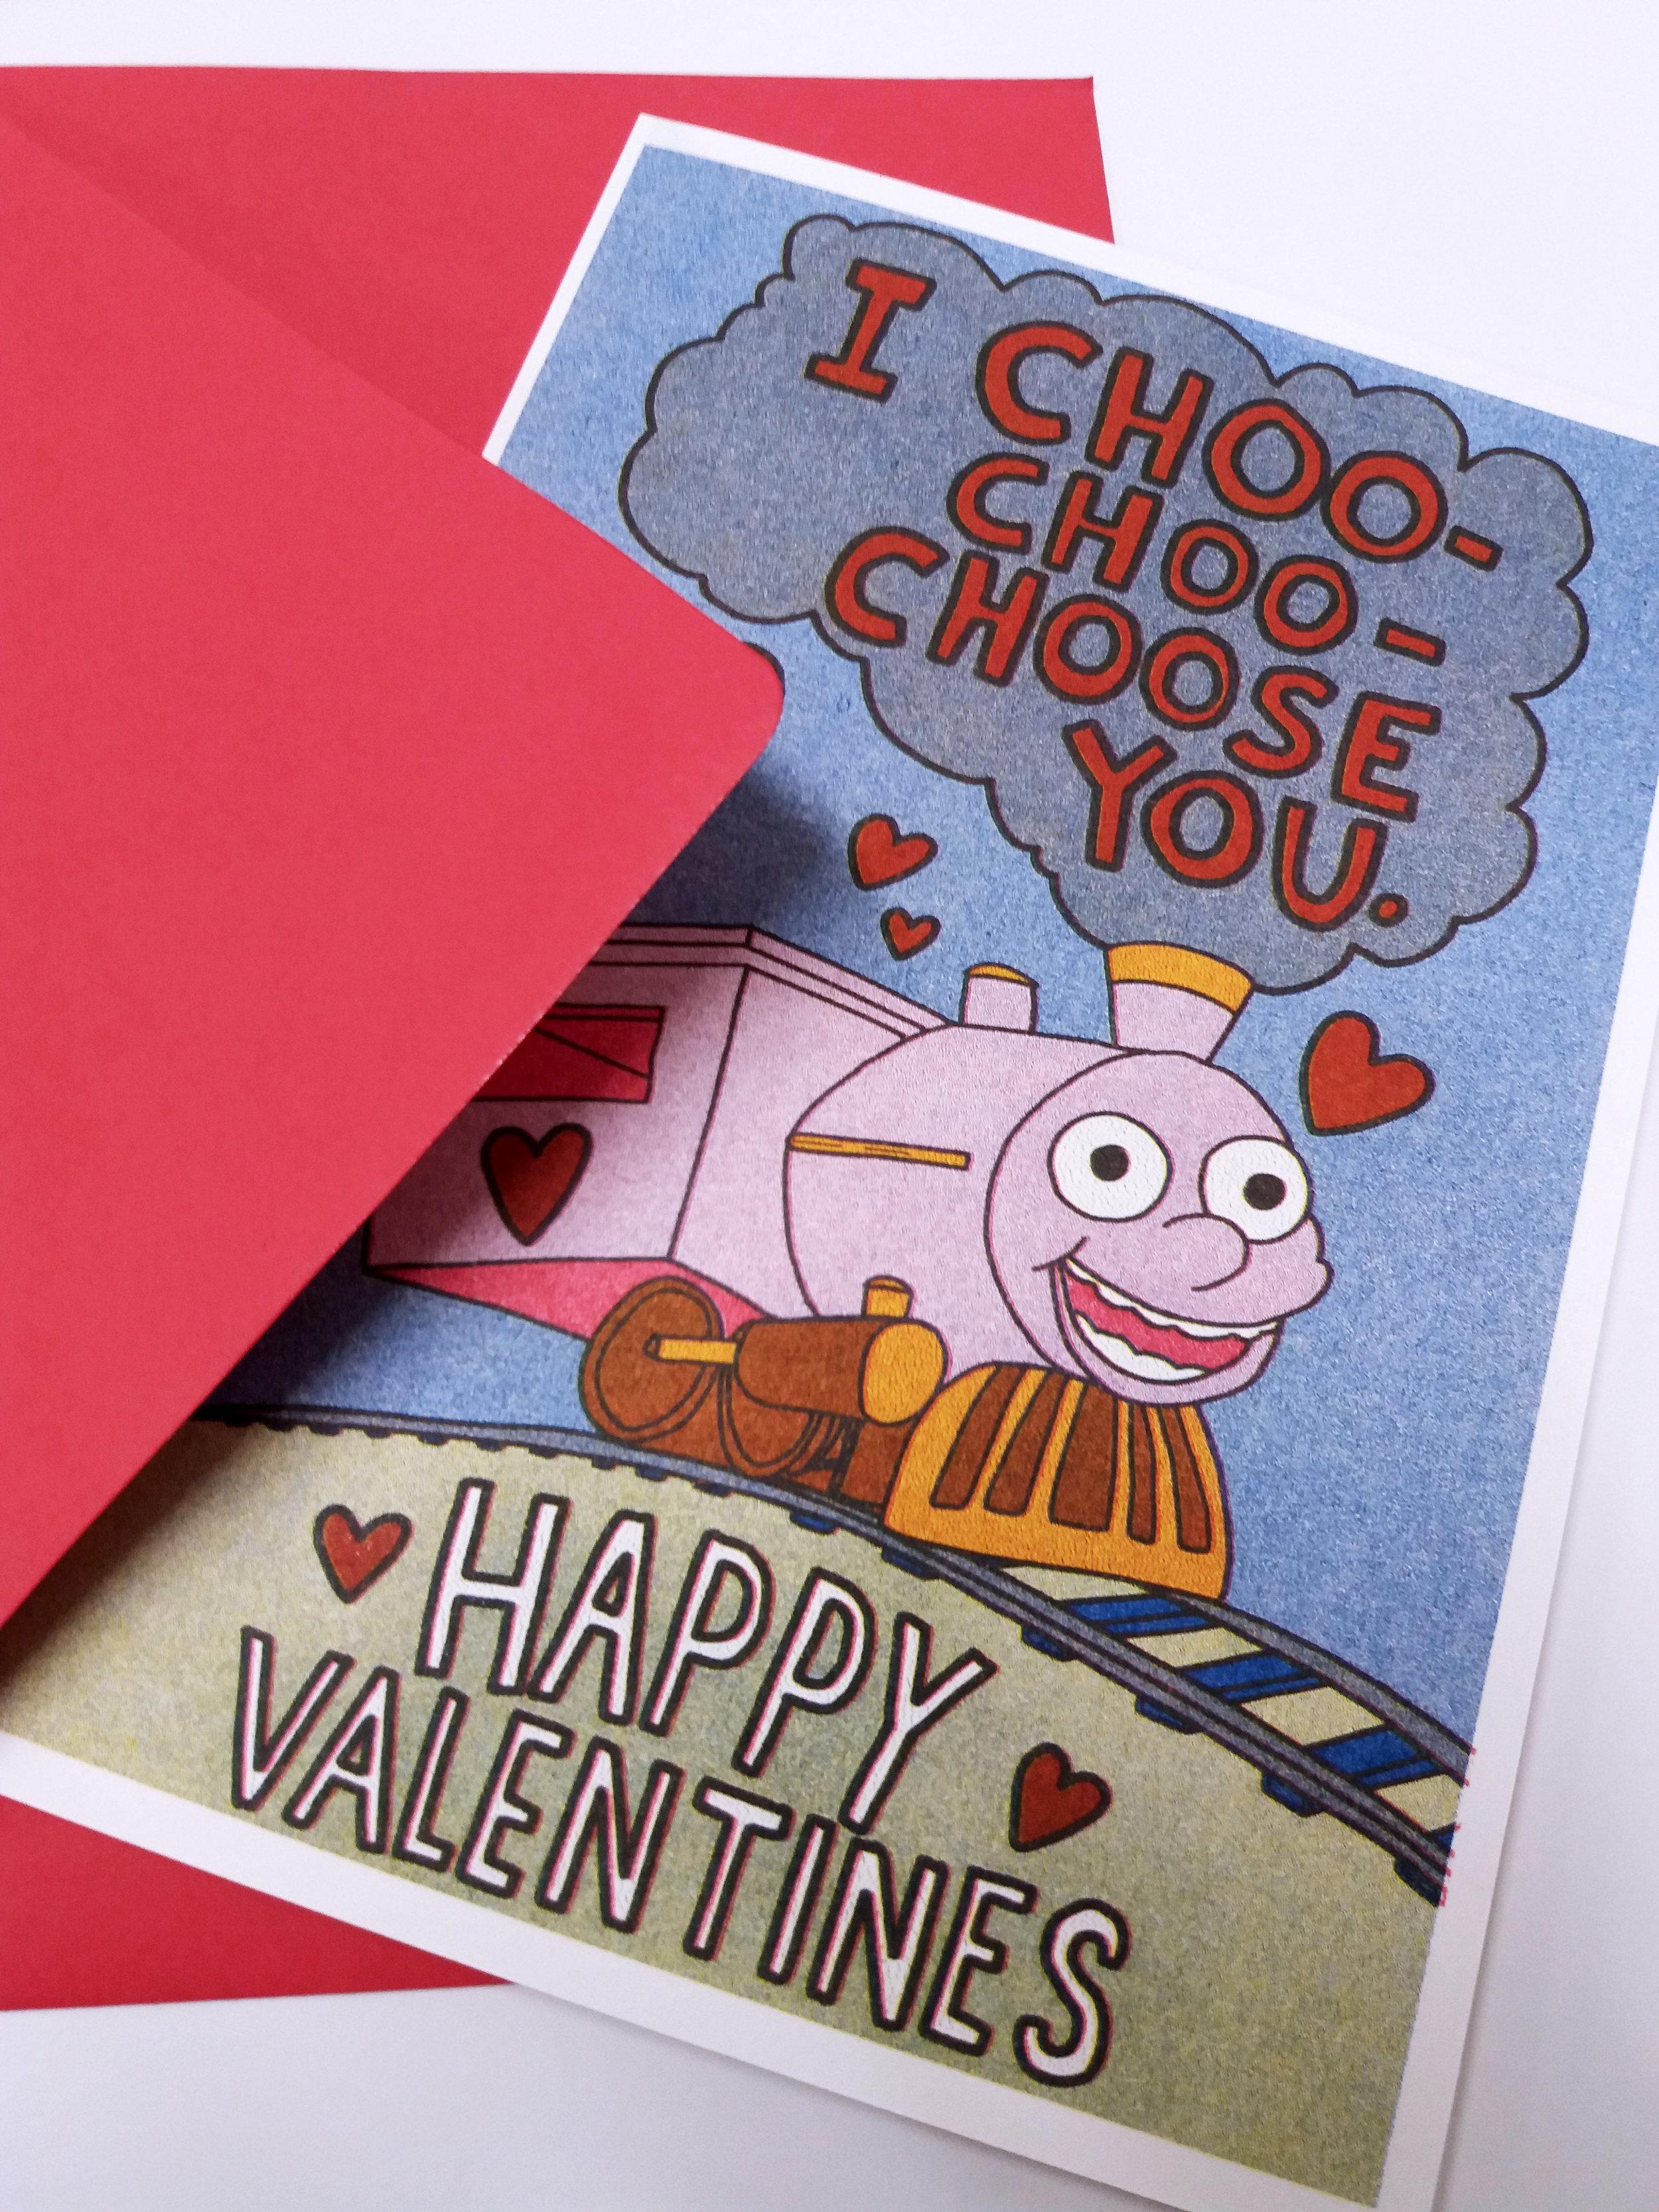 photo about I Choo Choo Choose You Printable Card identified as \